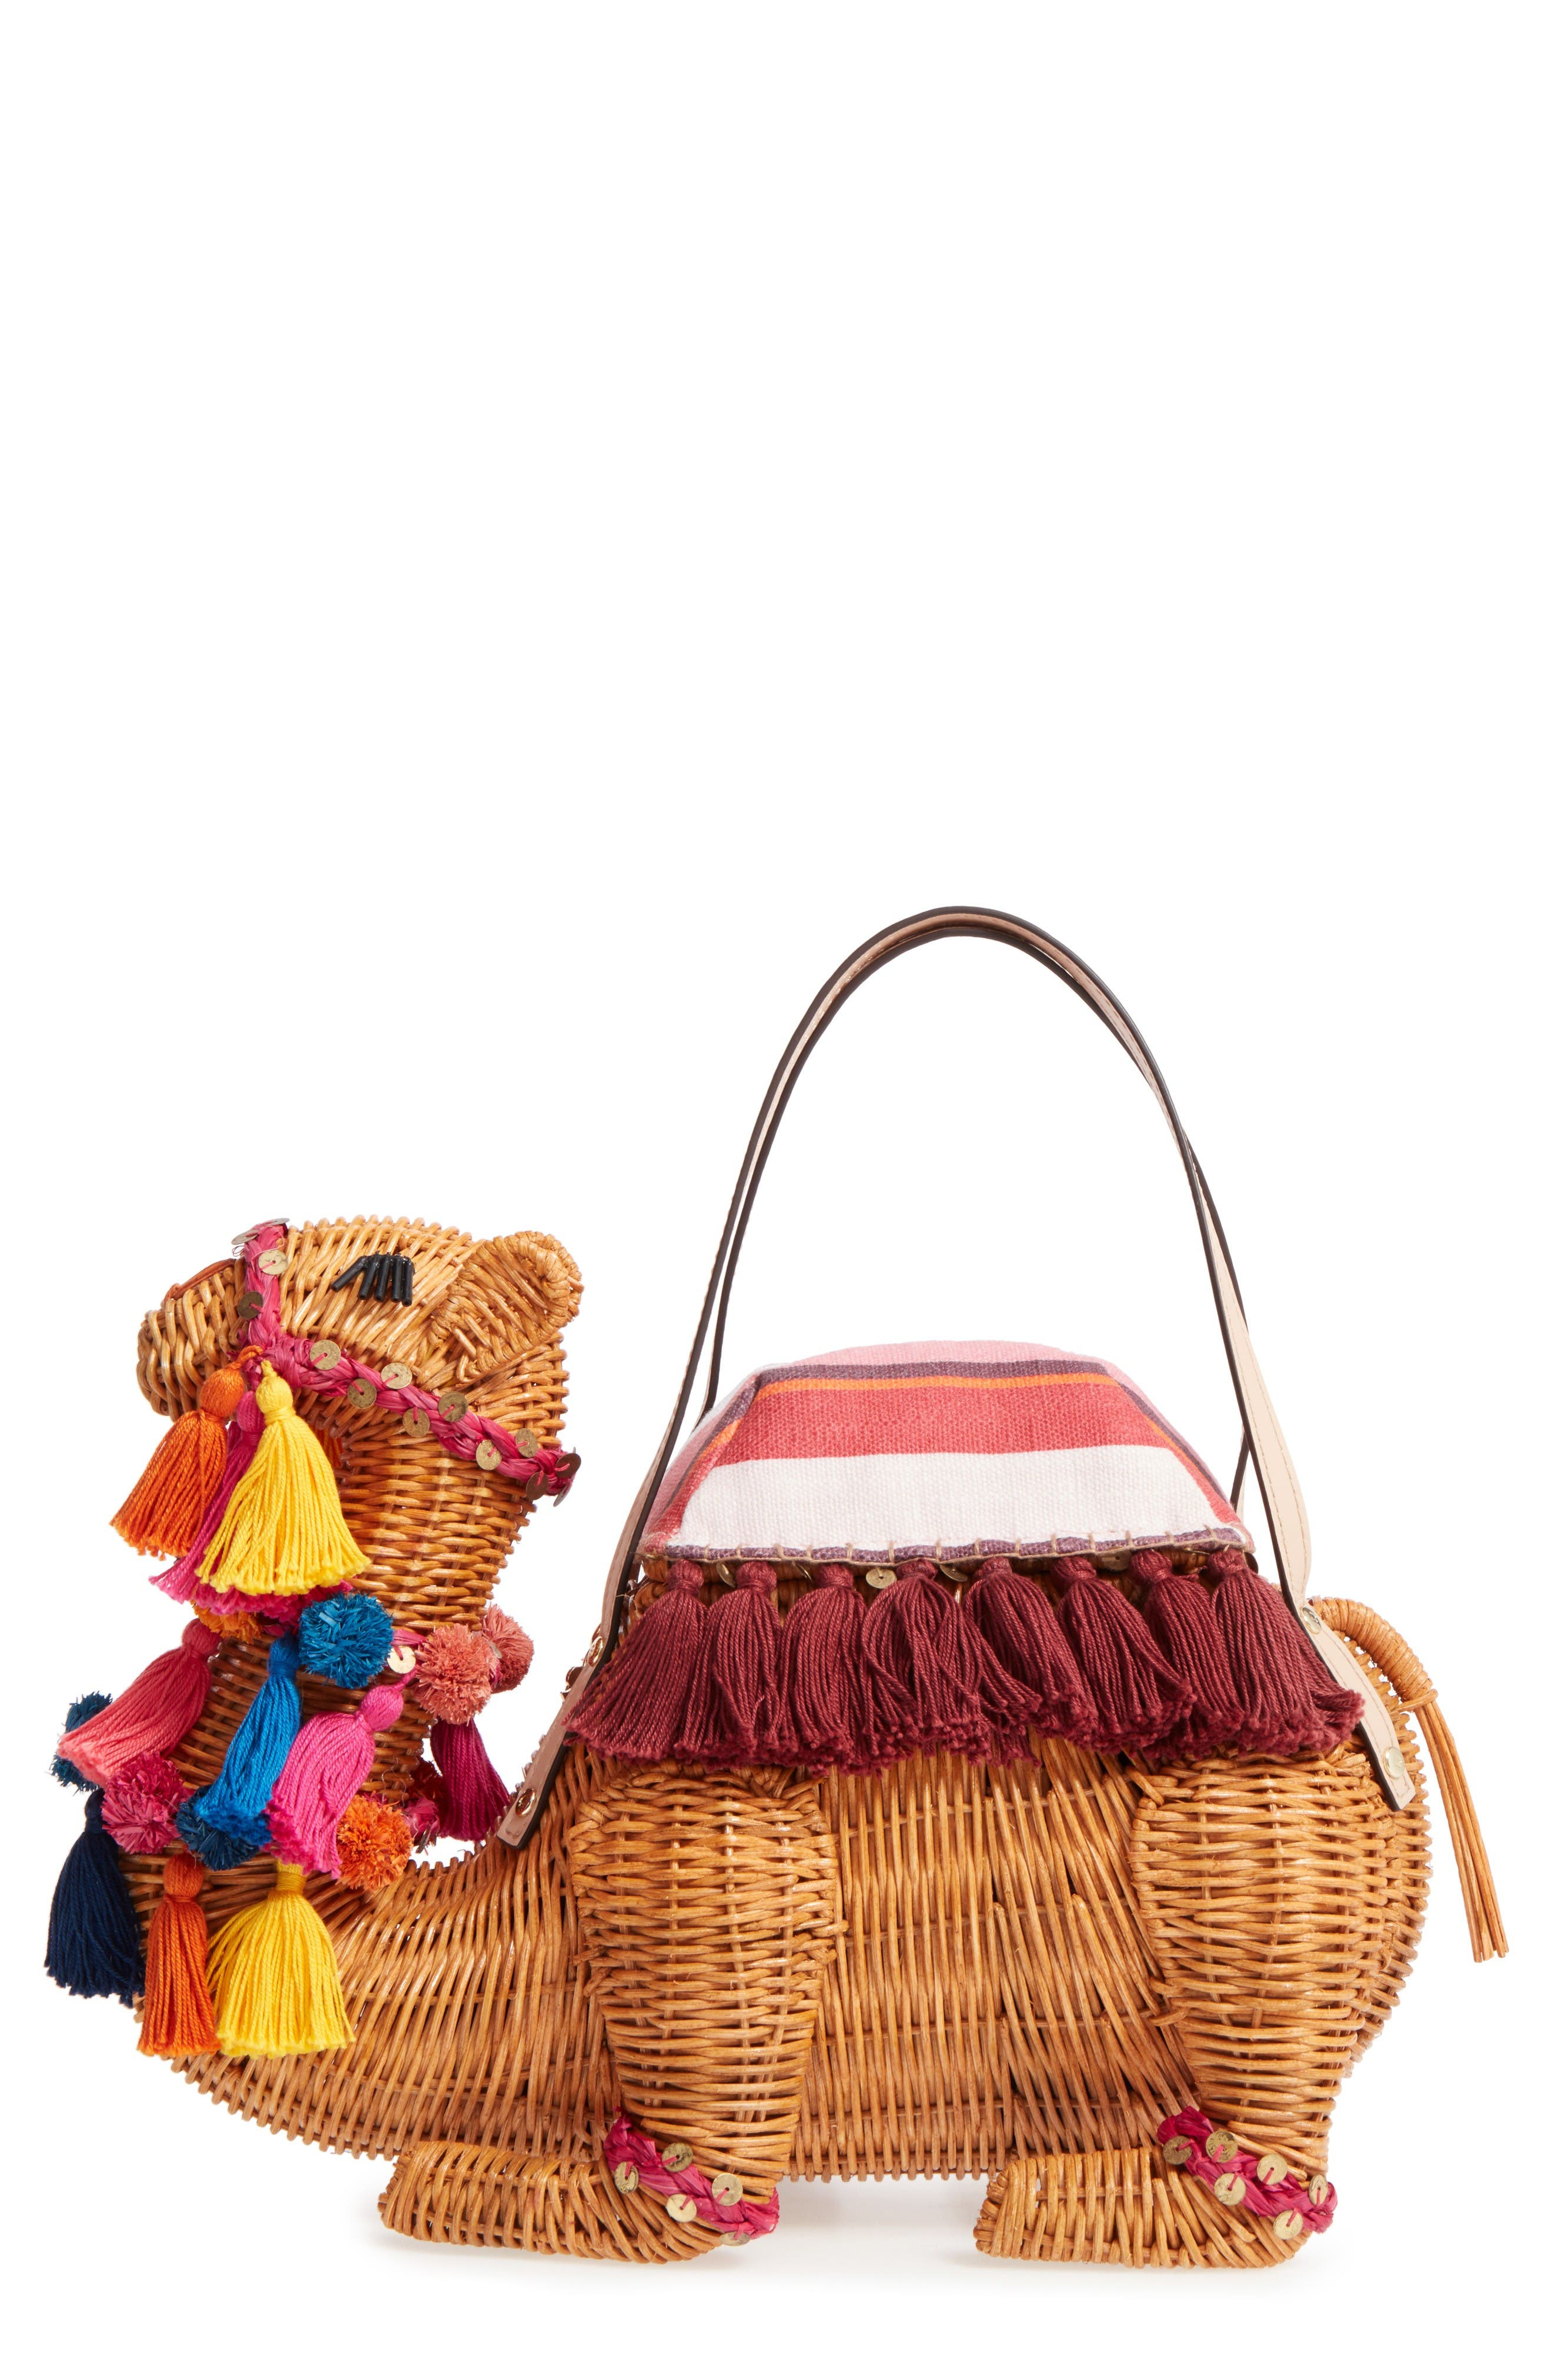 Main Image - kate spade new york spice things up wicker camel handbag